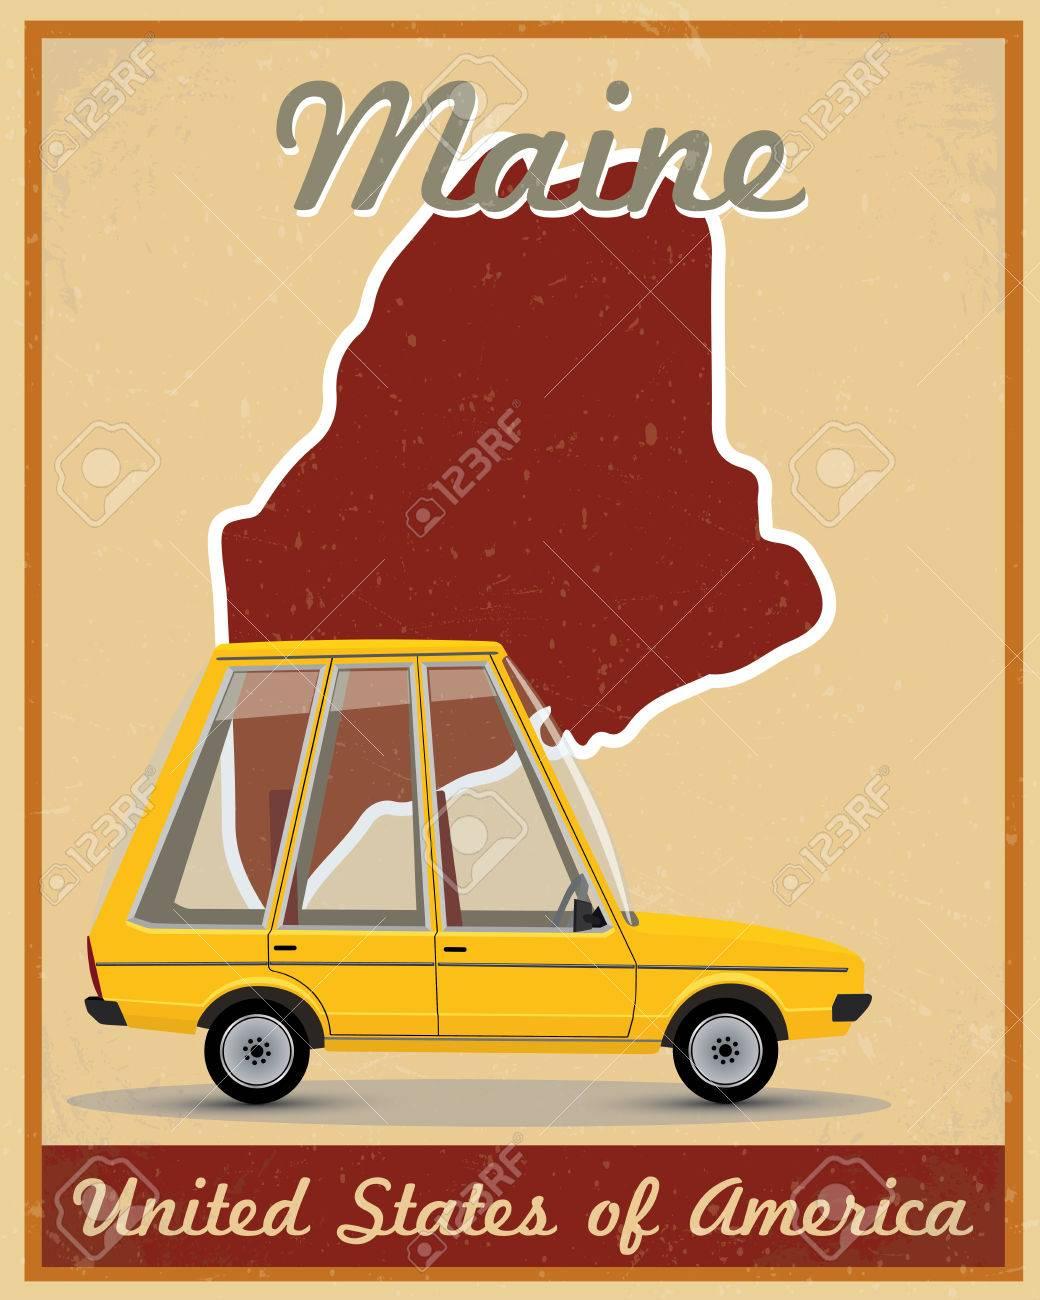 Maine road trip vintage poster.